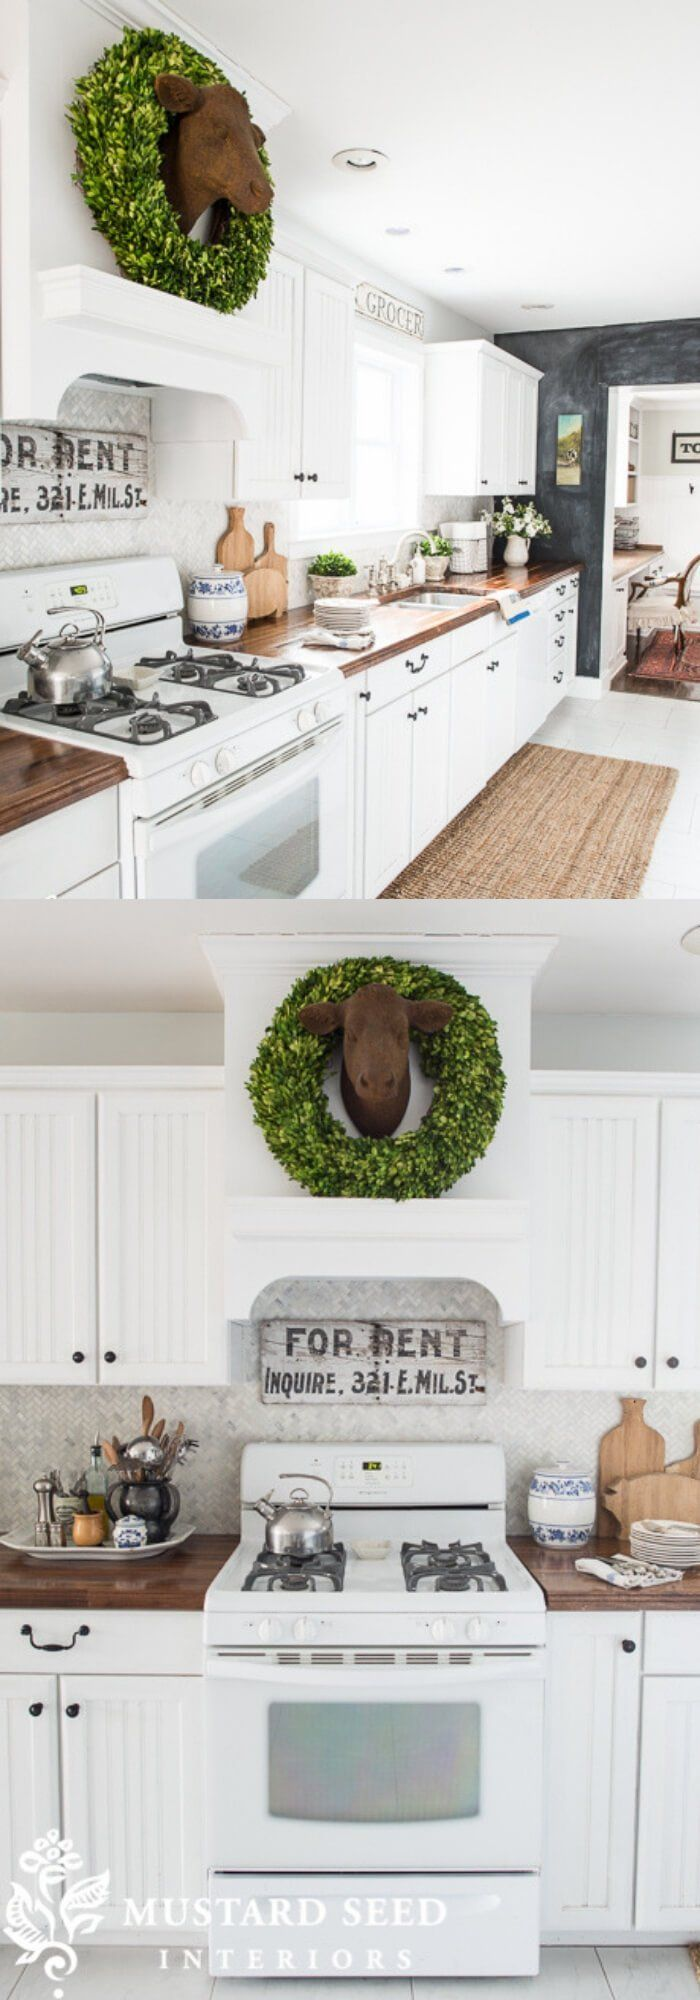 23+ Inspiring Farmhouse Kitchen Design & Decor Ideas For